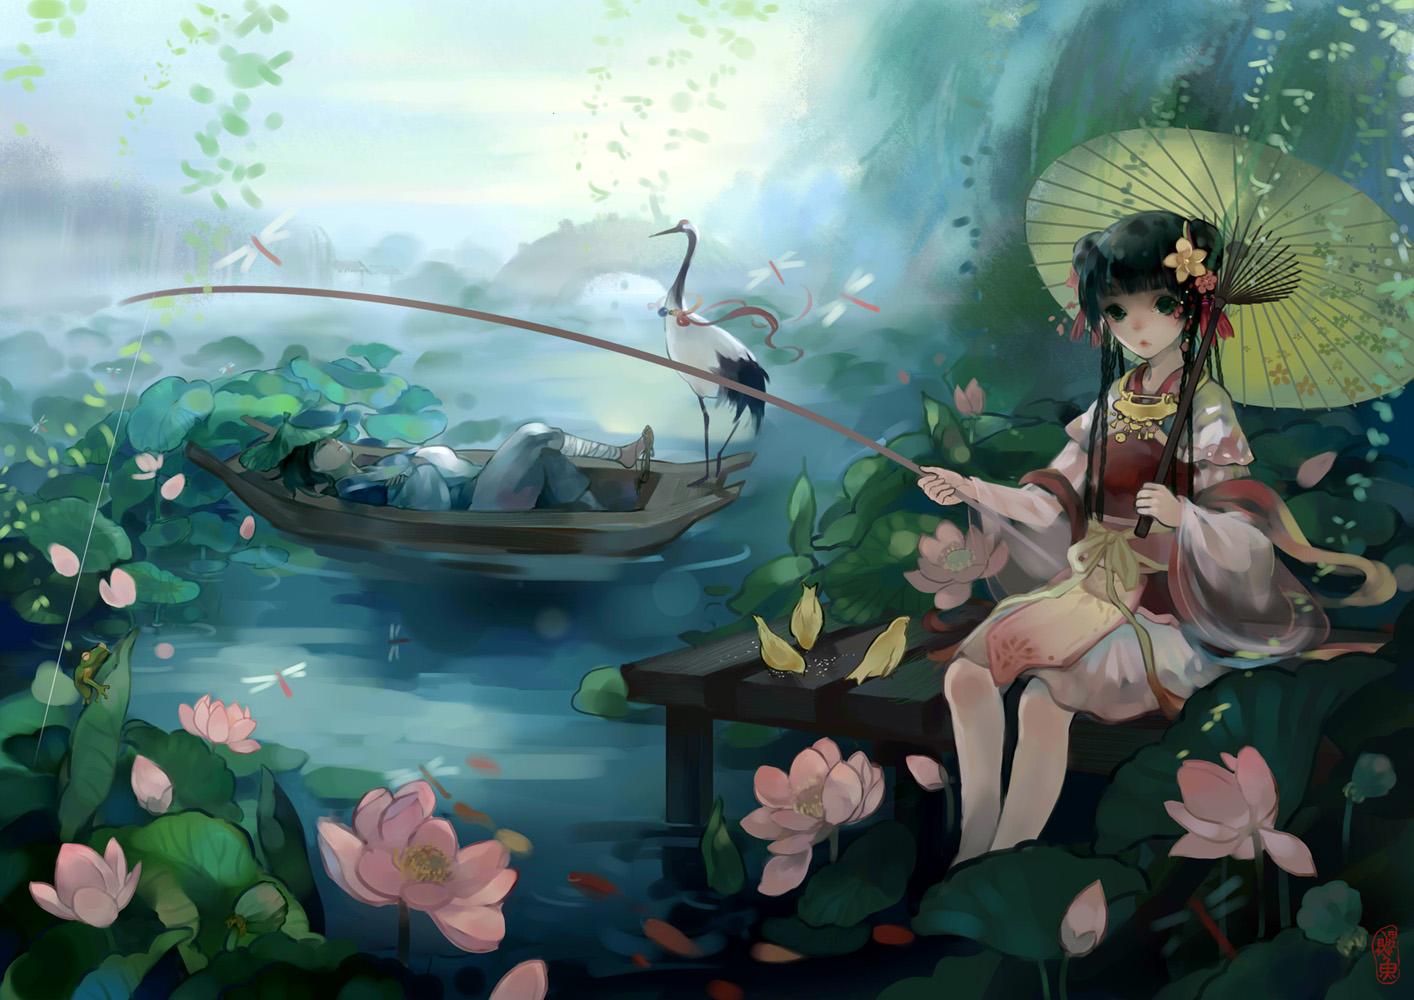 animal bird black_hair boat bow braids chinese_clothes flowers frog jpeg_artifacts karas_5812 long_hair original petals ribbons sleeping umbrella water